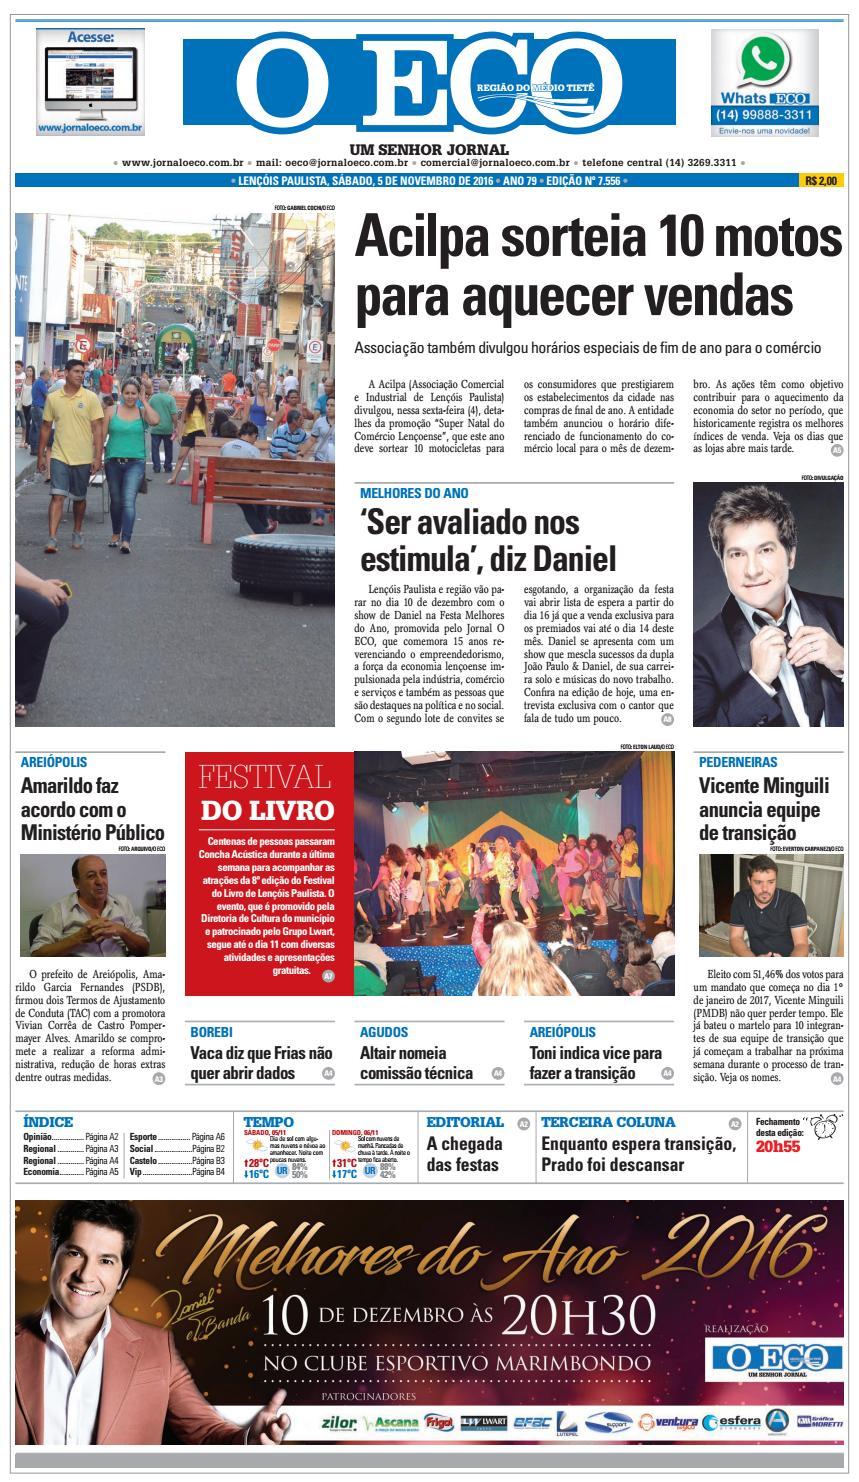 Jornaloeco 5 de novembro de 2016 by Jornal O ECO - issuu ef4f479bf66